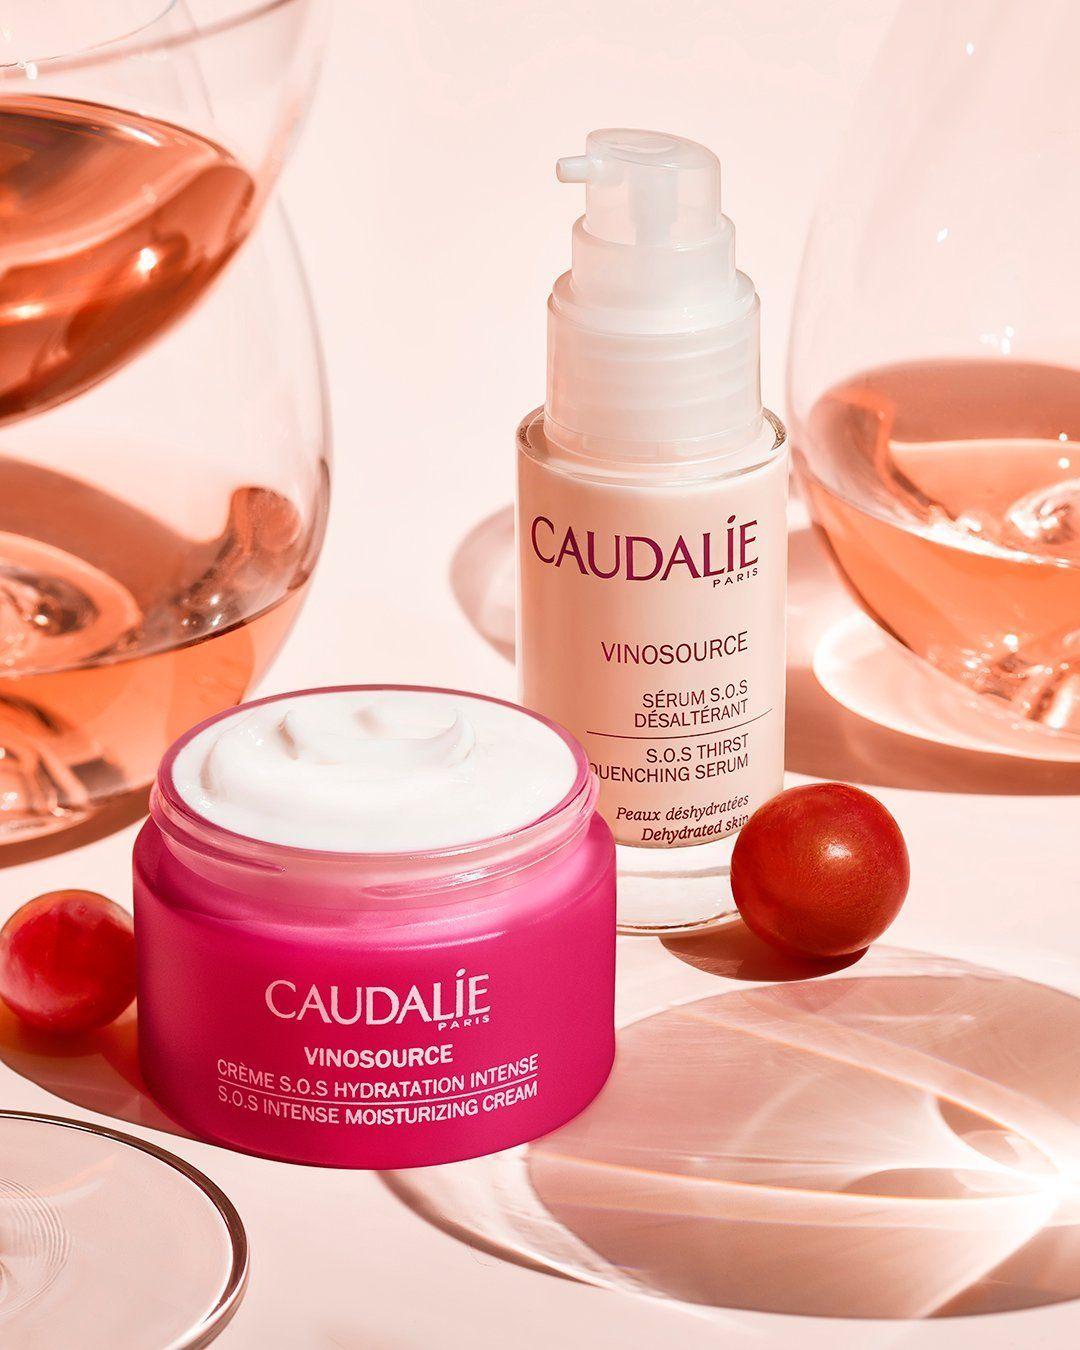 Vinopure Pore Purifying Gel Cleanser by Caudalie #6